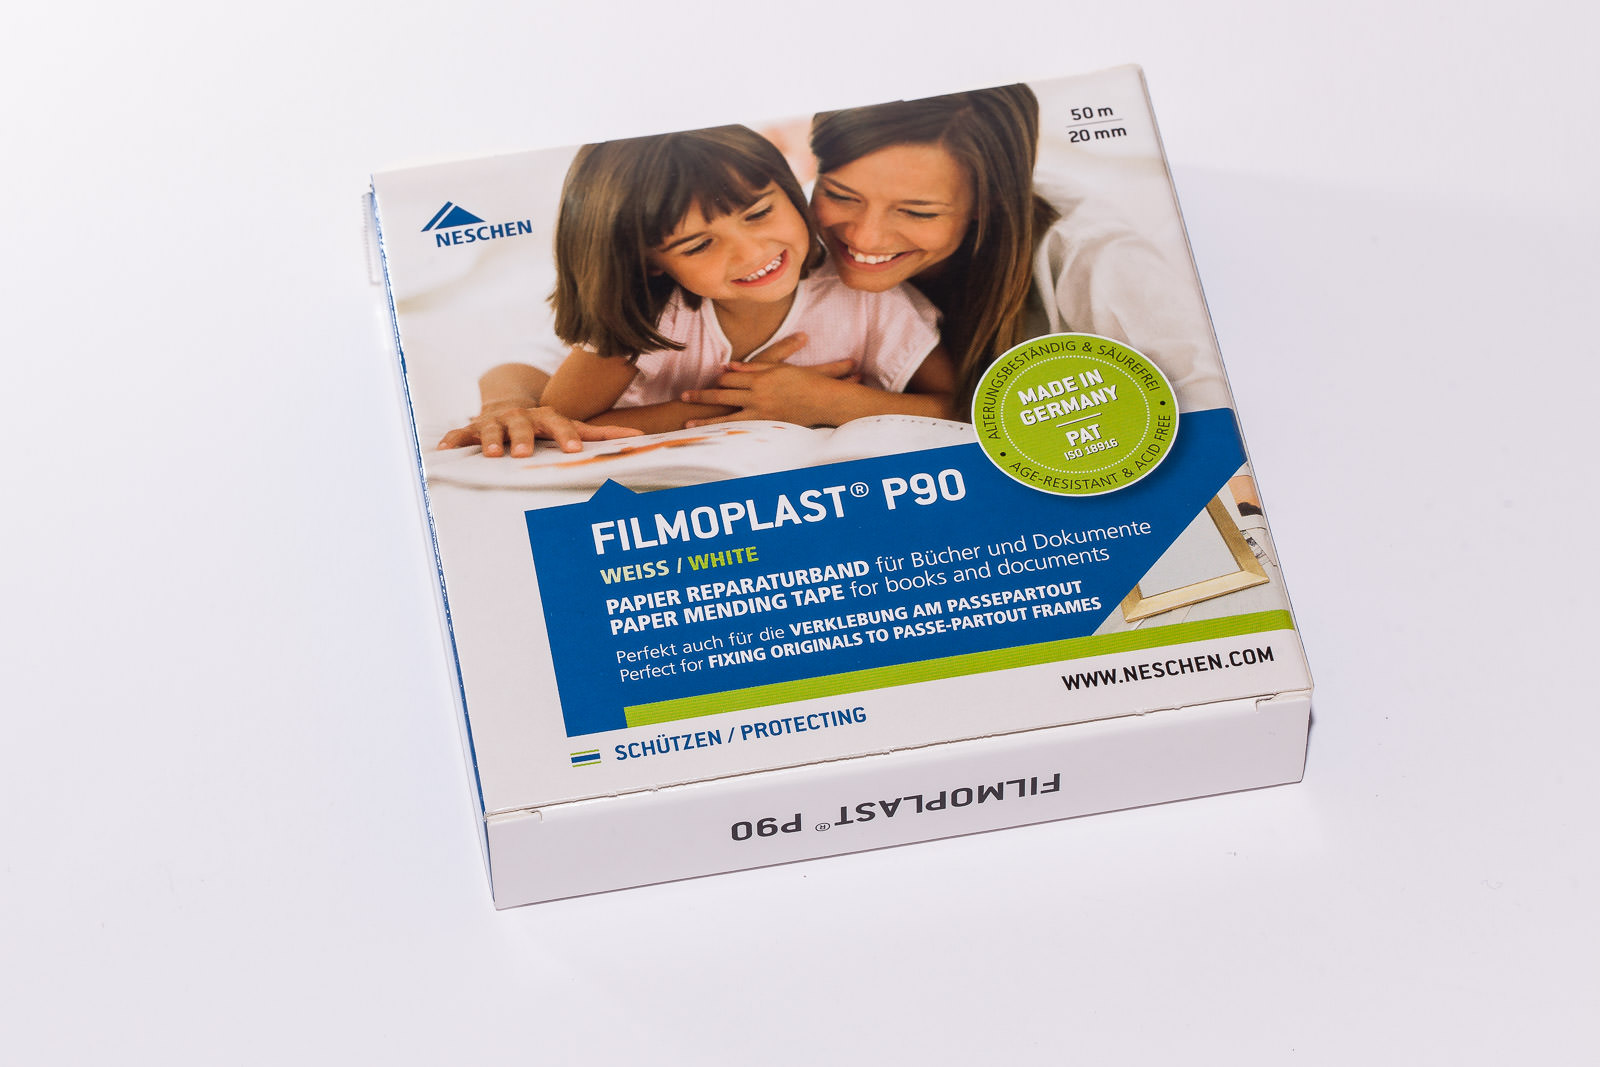 Filmoplast P 90